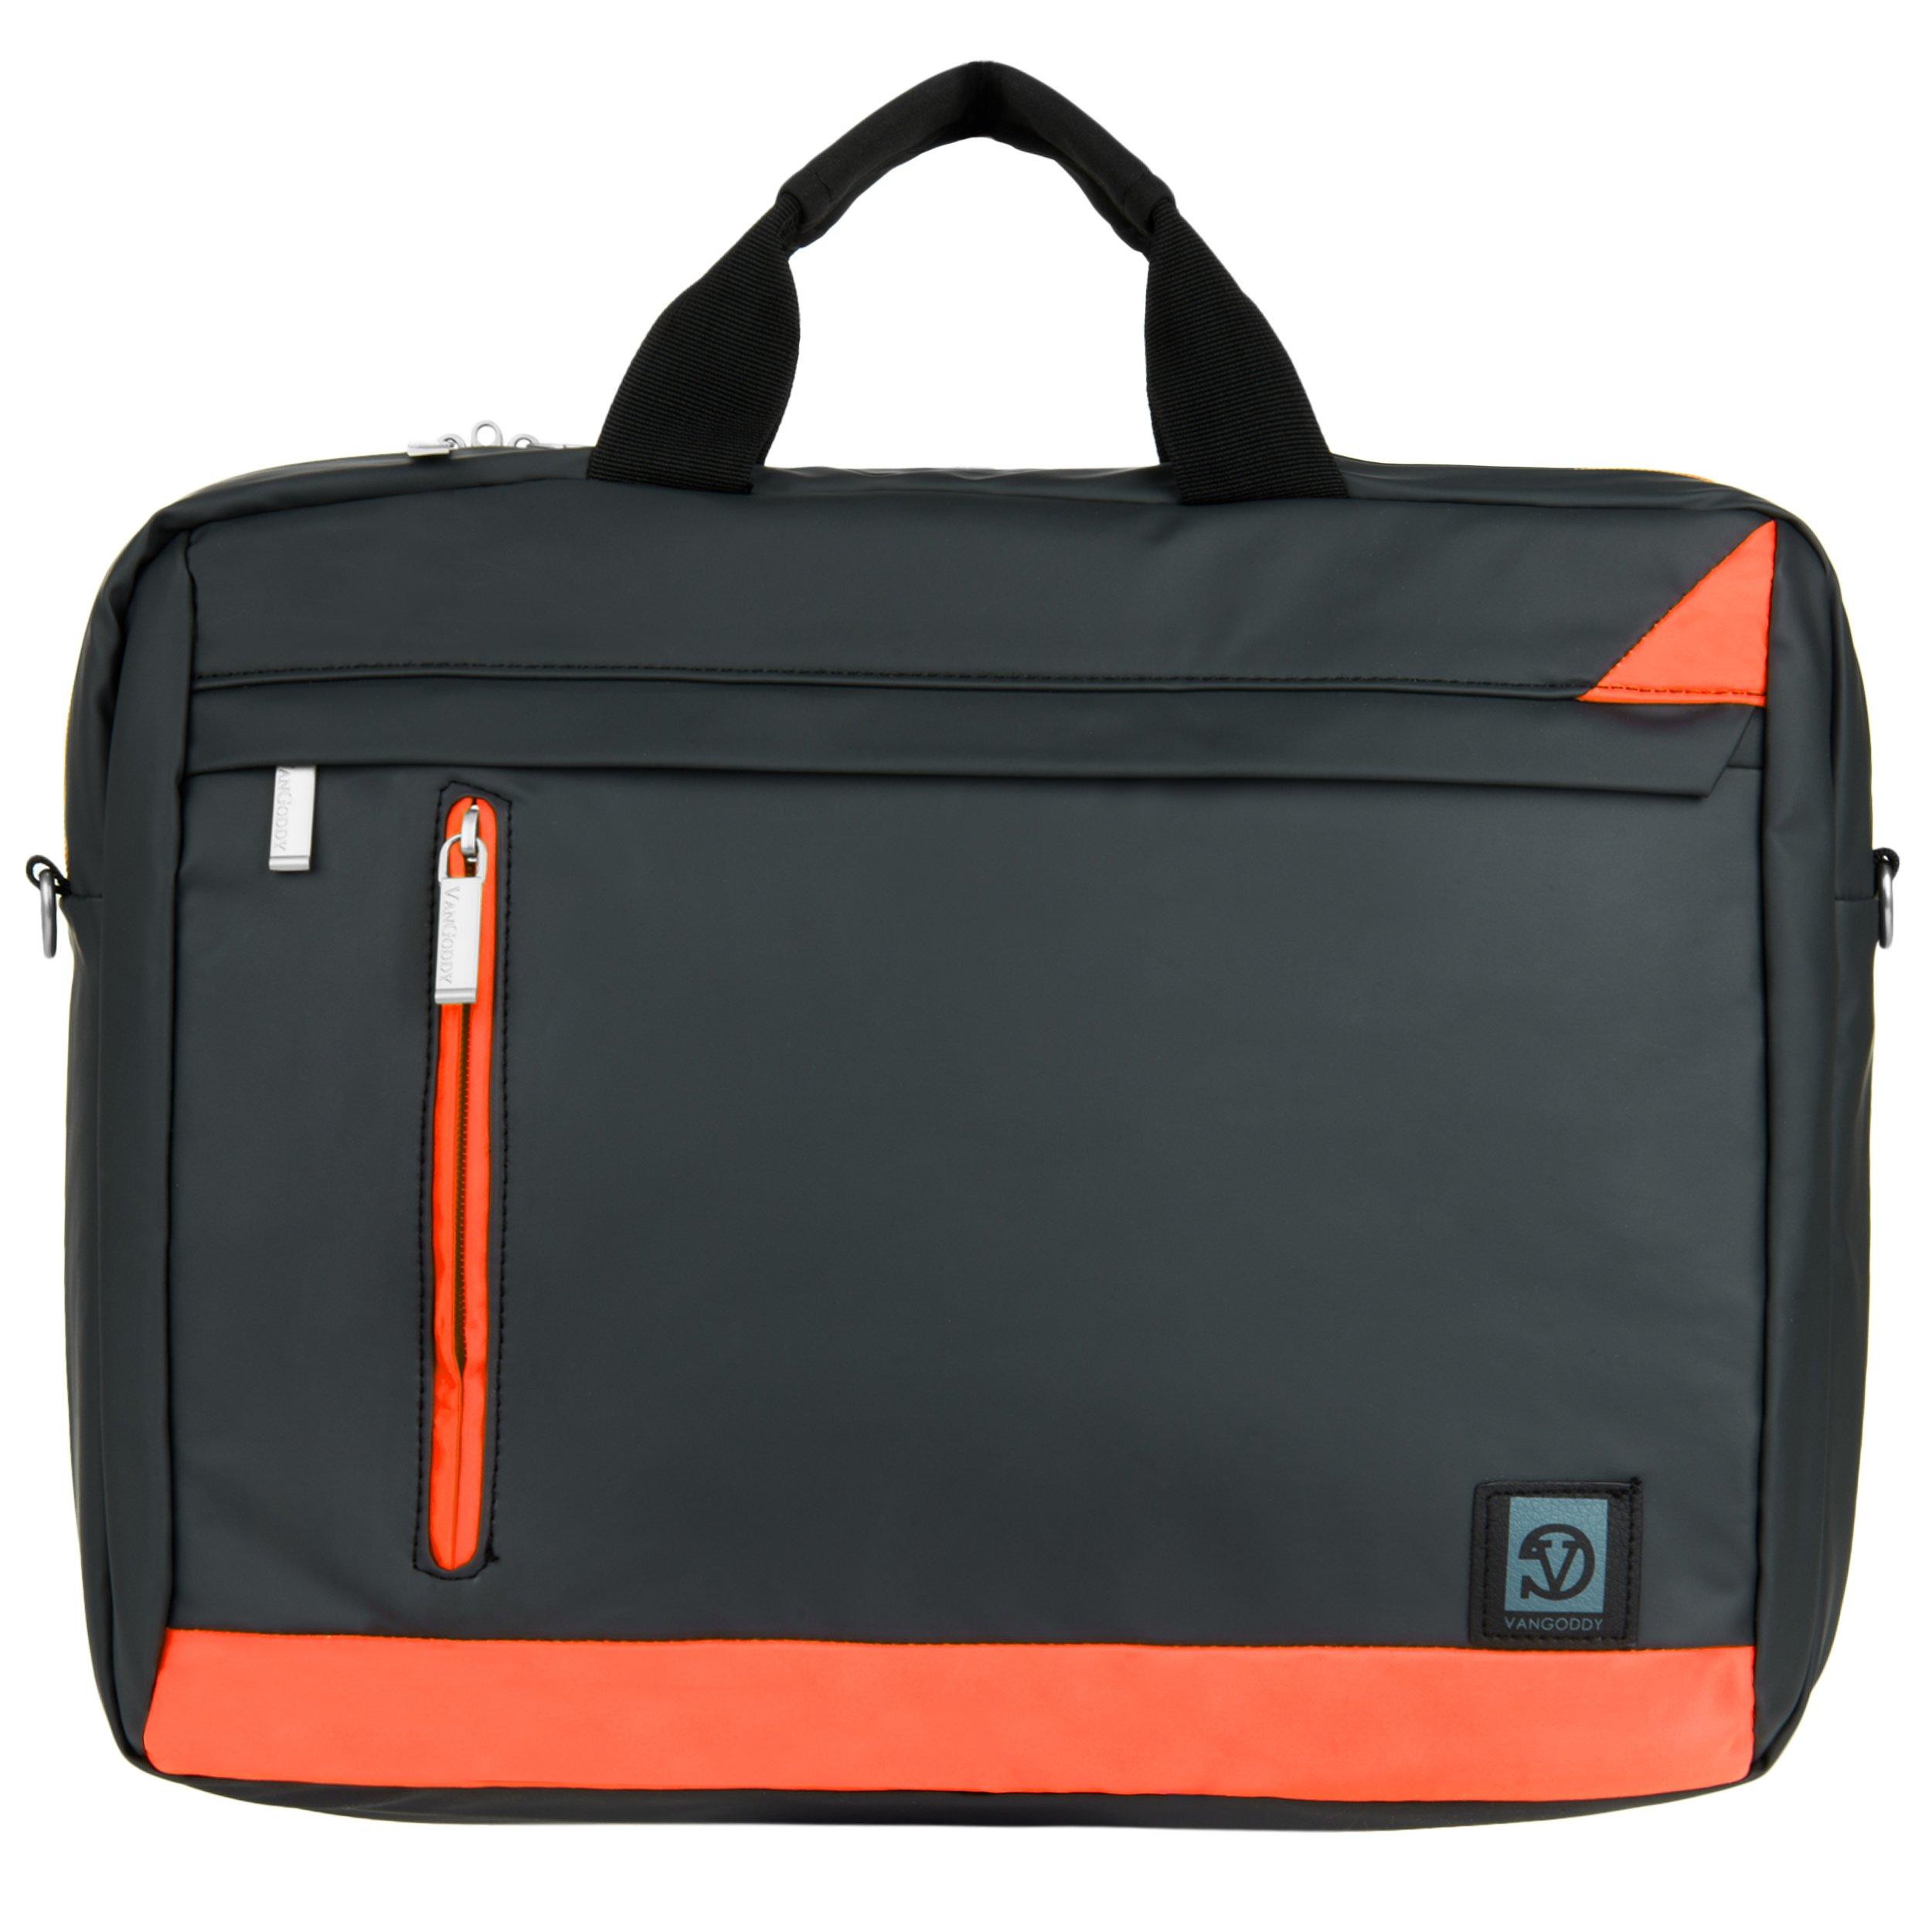 VanGoddy Adler Briefcase Messenger Bag for Dell 14 to 15.6-inch Laptops (Orange)